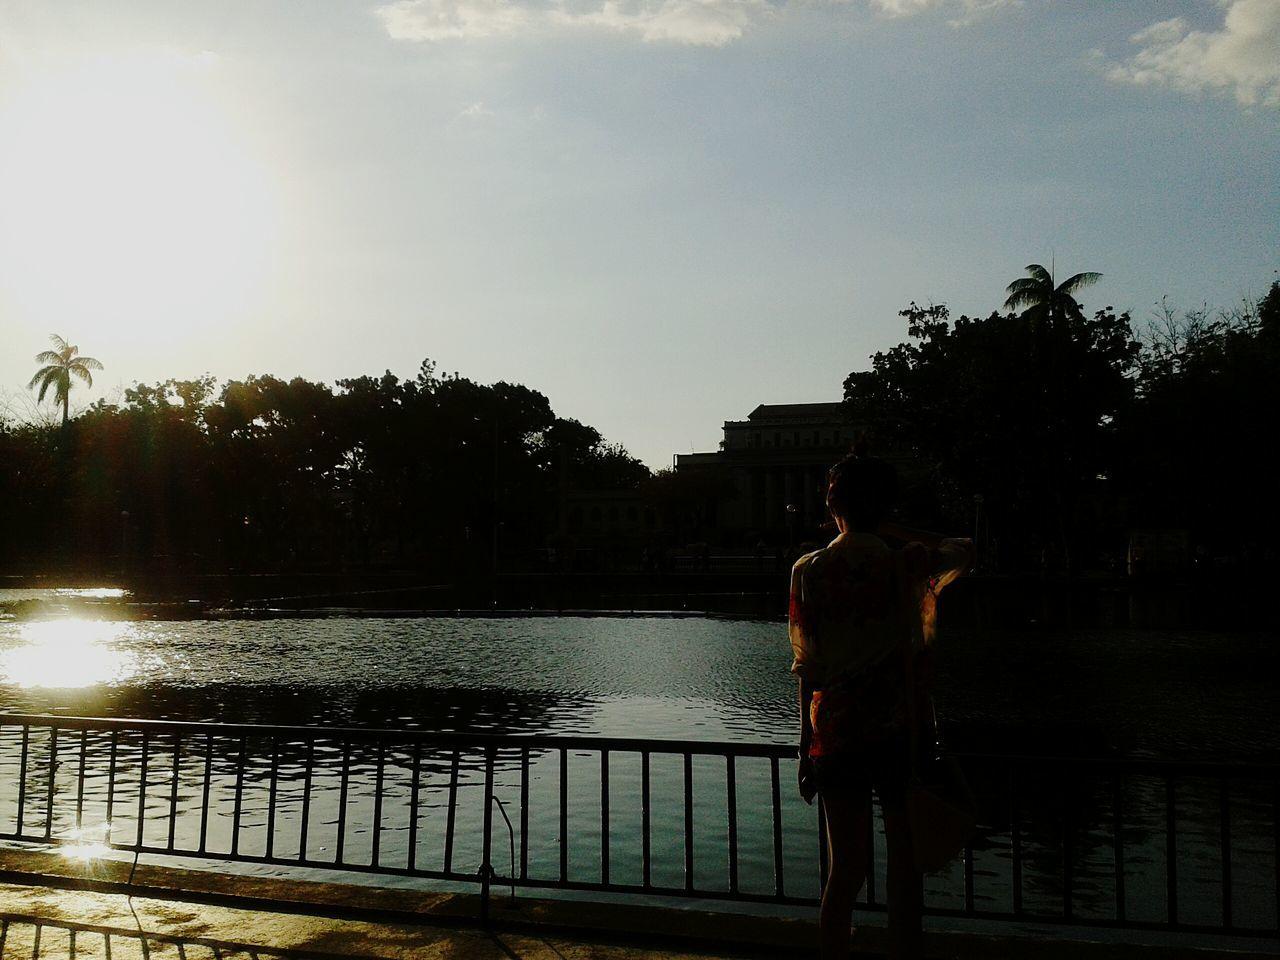 Woman Looking At River, Rear View